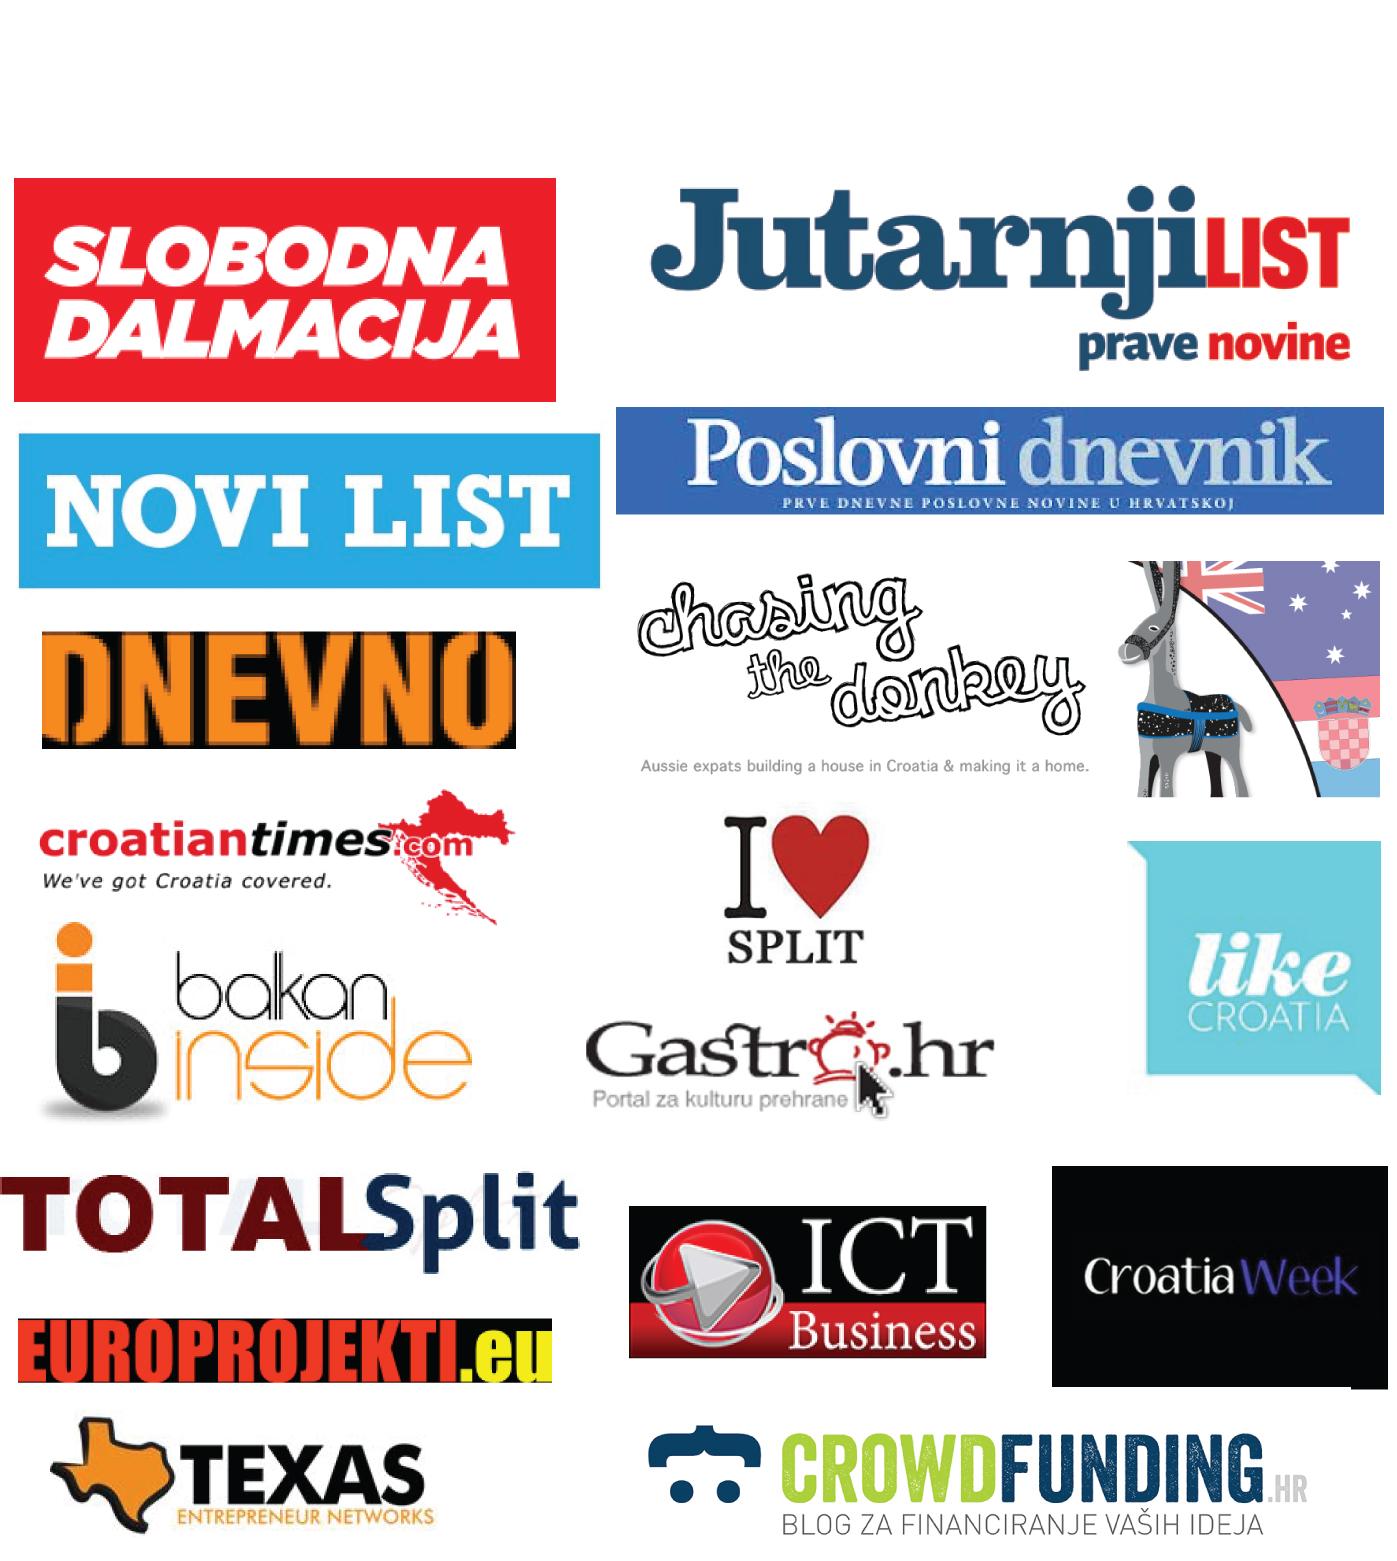 go Quixotic - The people\'s epicurean fusion cafe & bar in Split ...